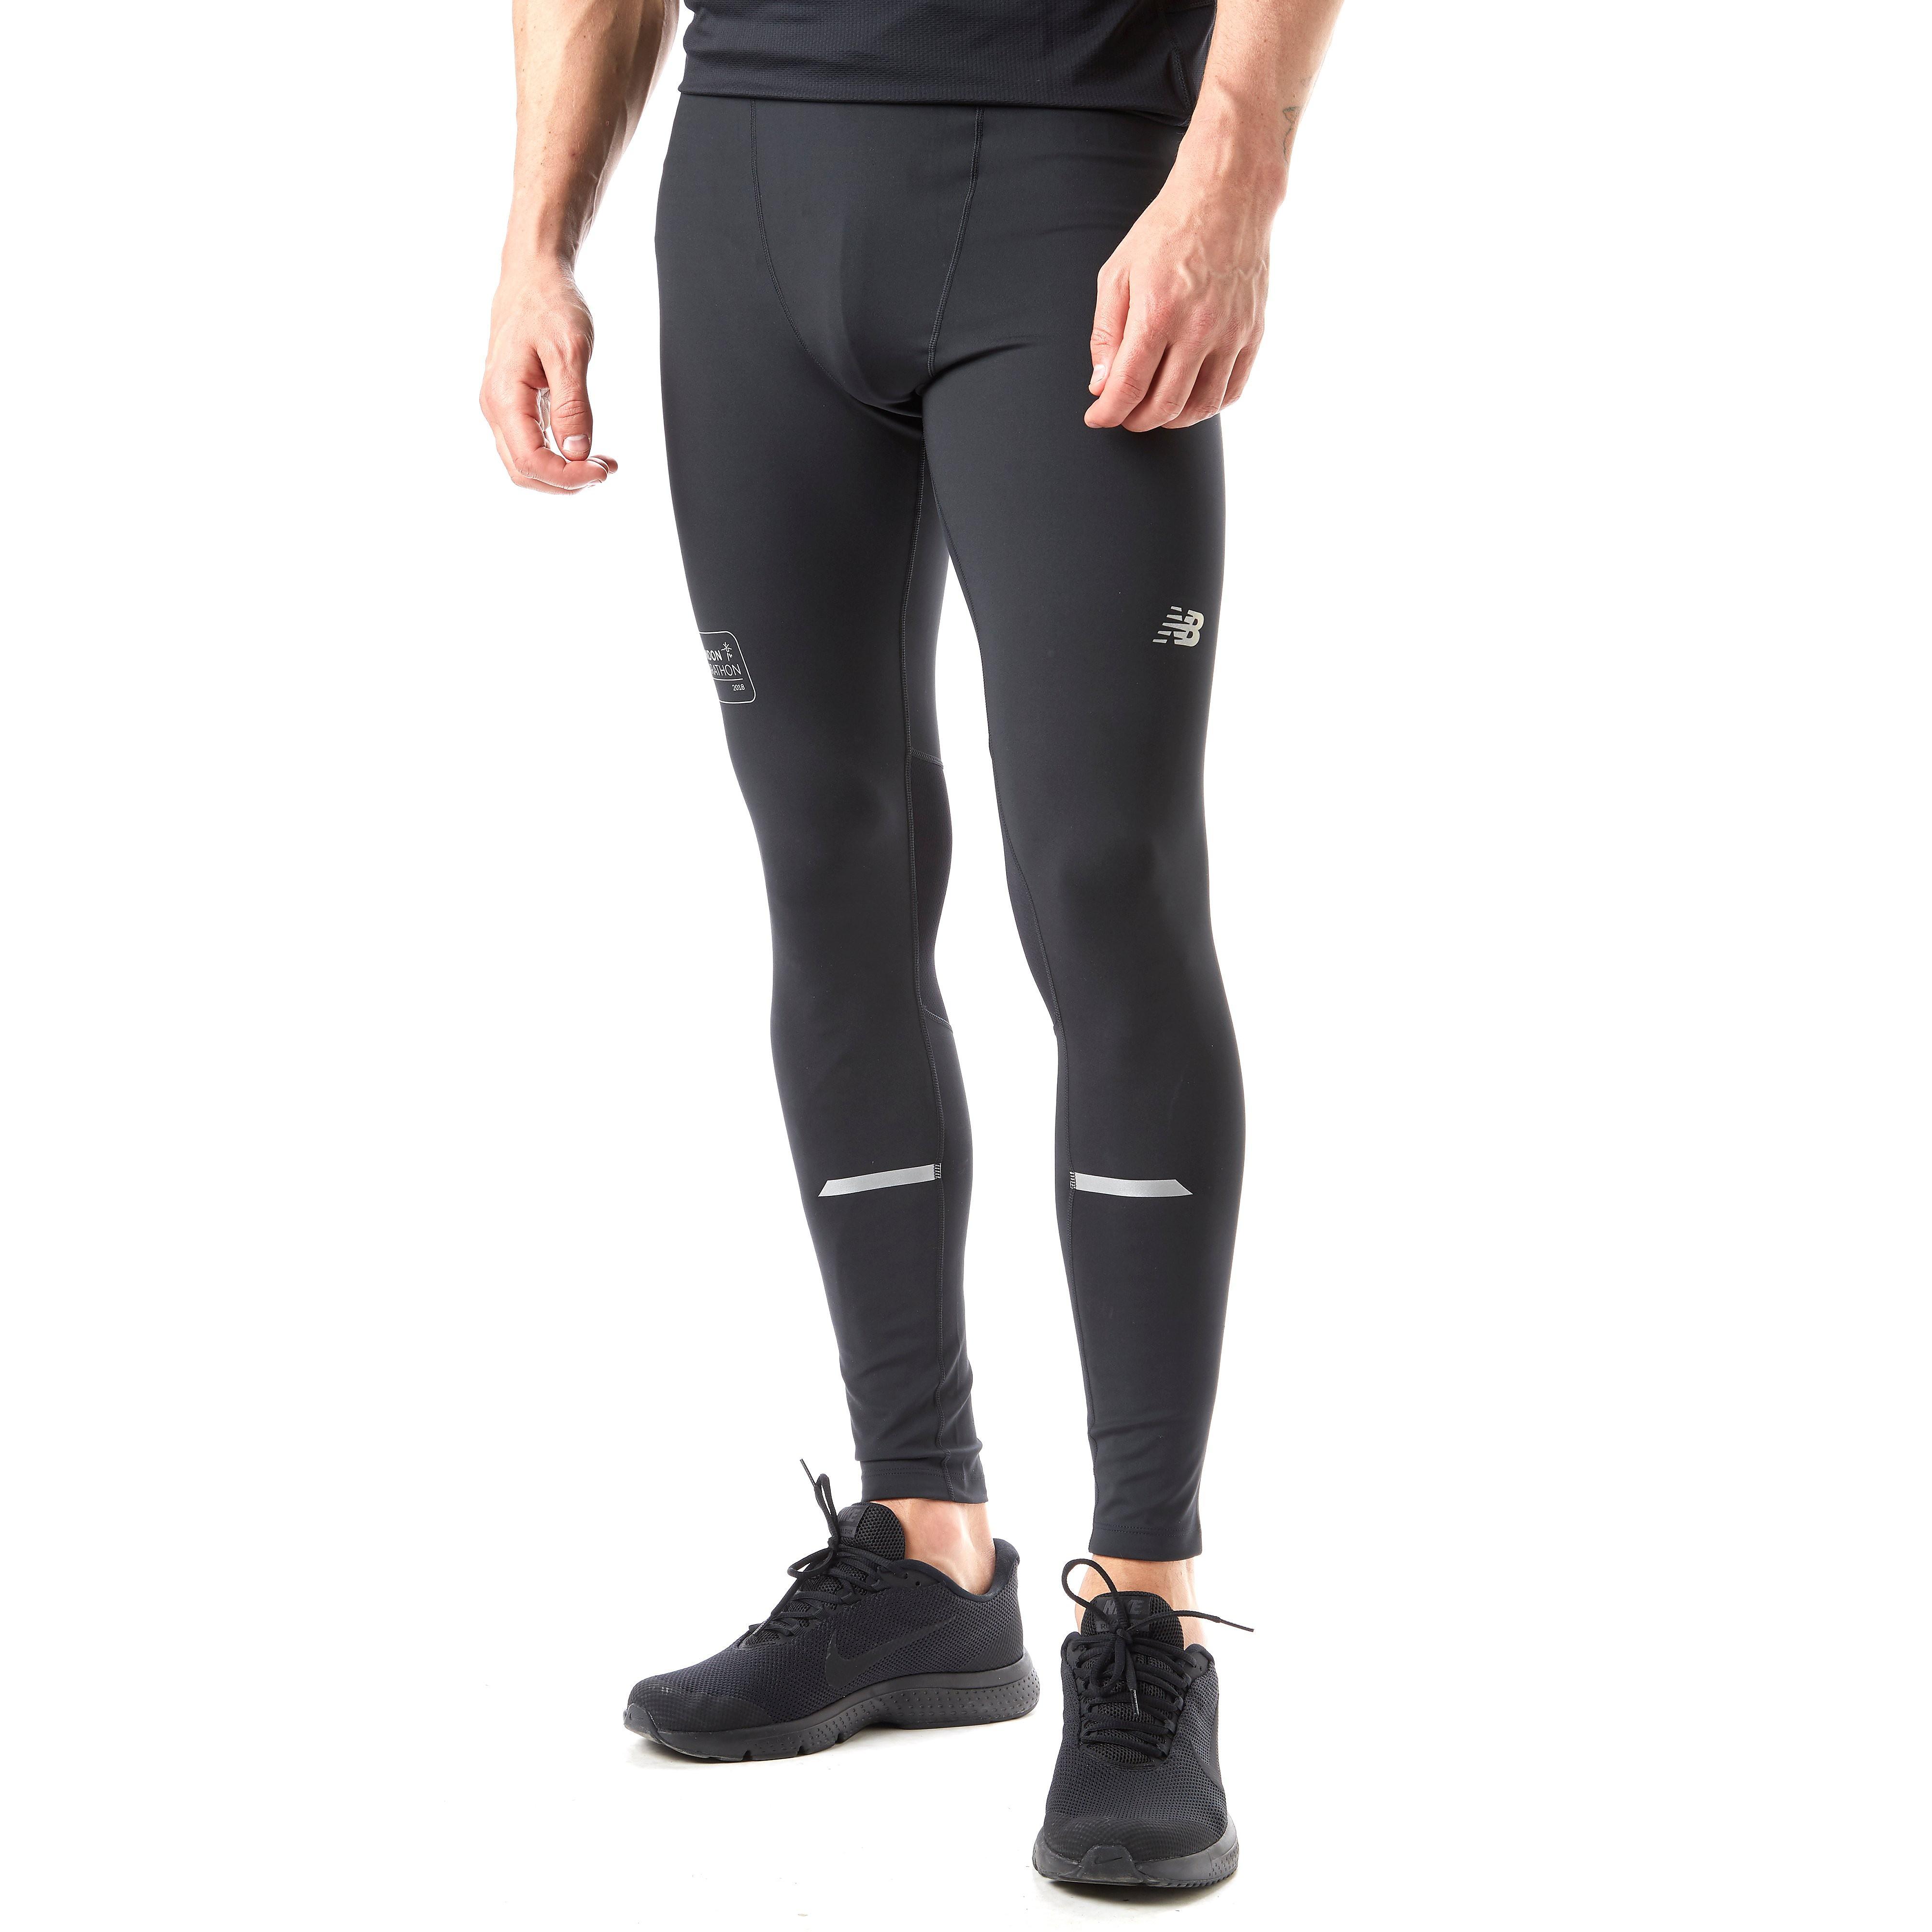 New Balance London Marathon Edition Impact Men's Running Tights